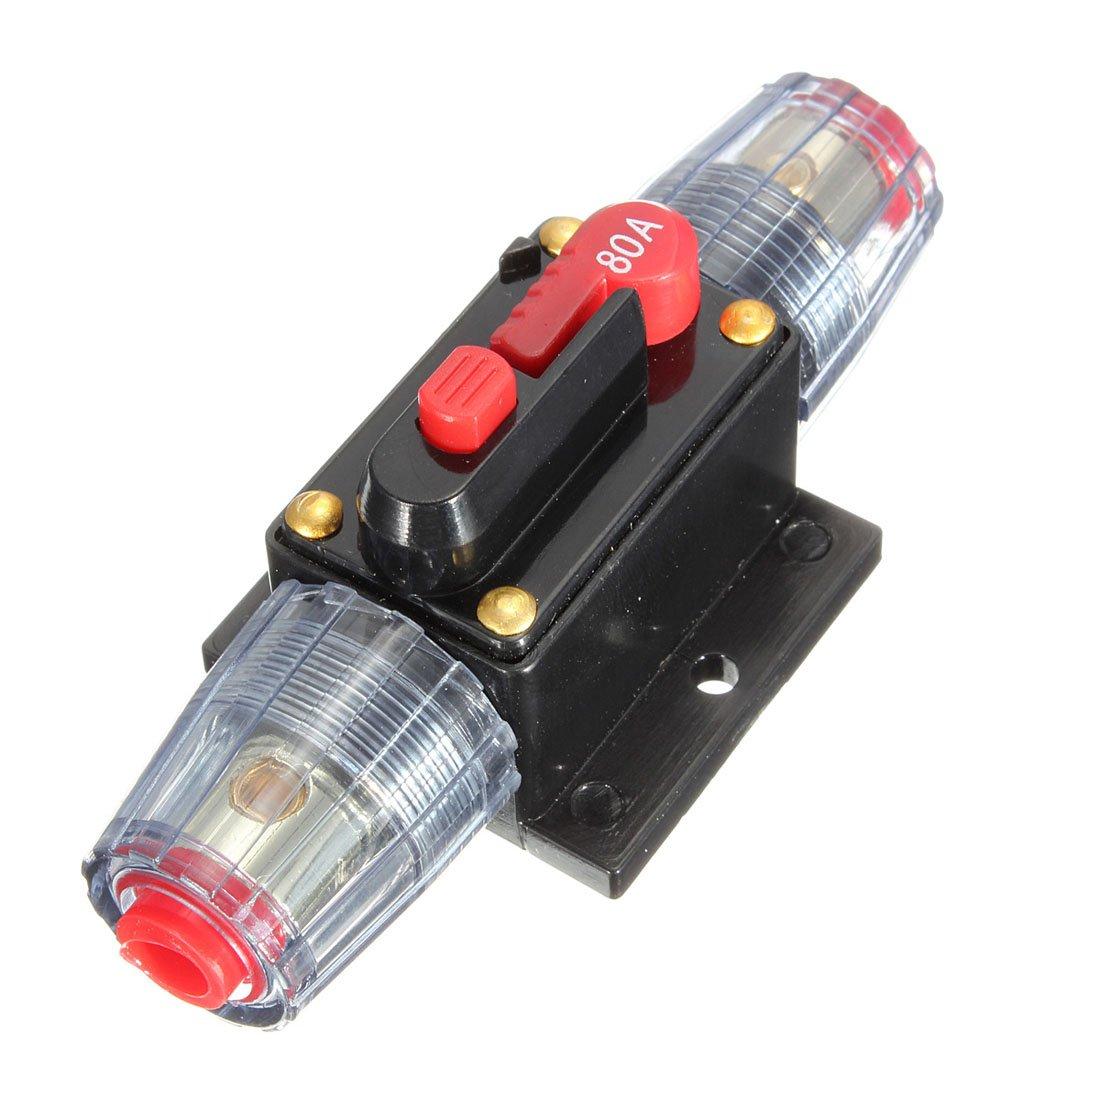 DC 12V/24V/32V Car Stereo Audio Circuit Breaker Inline Fuse Holder (80A)